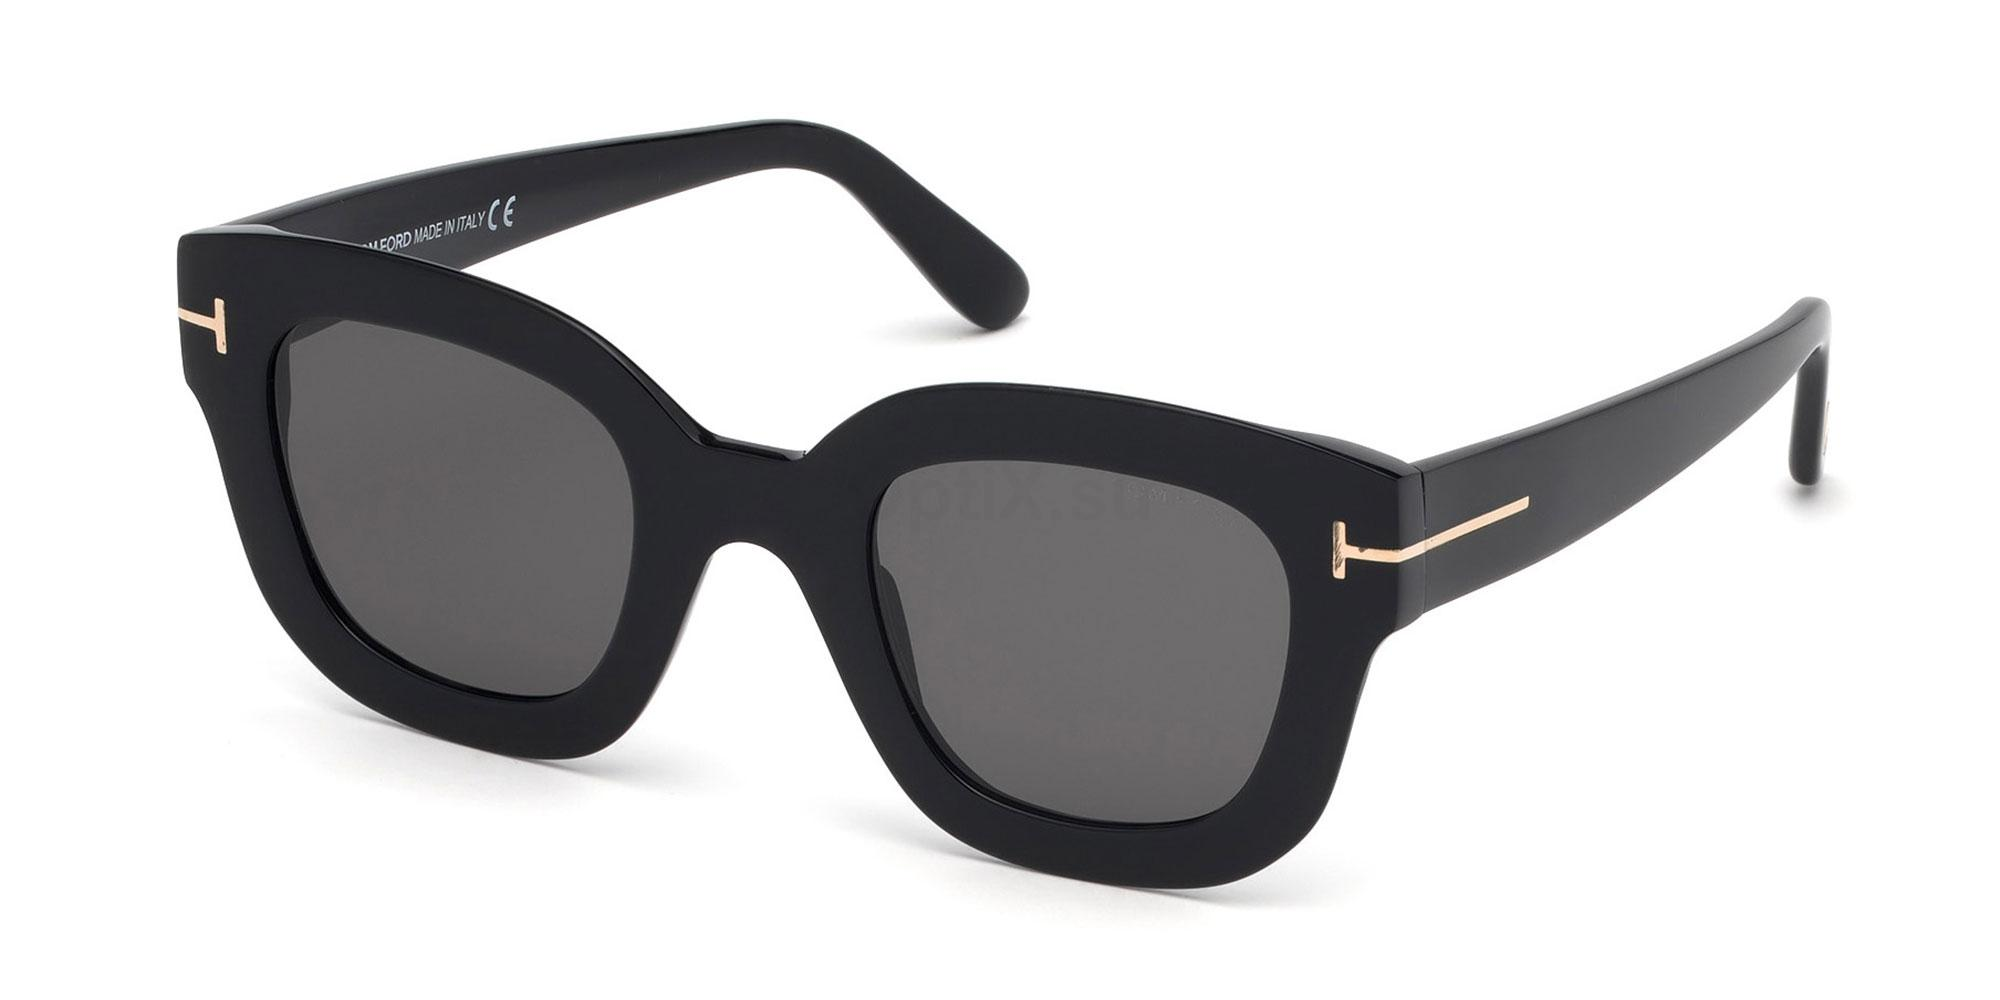 01A FT0659 Sunglasses, Tom Ford